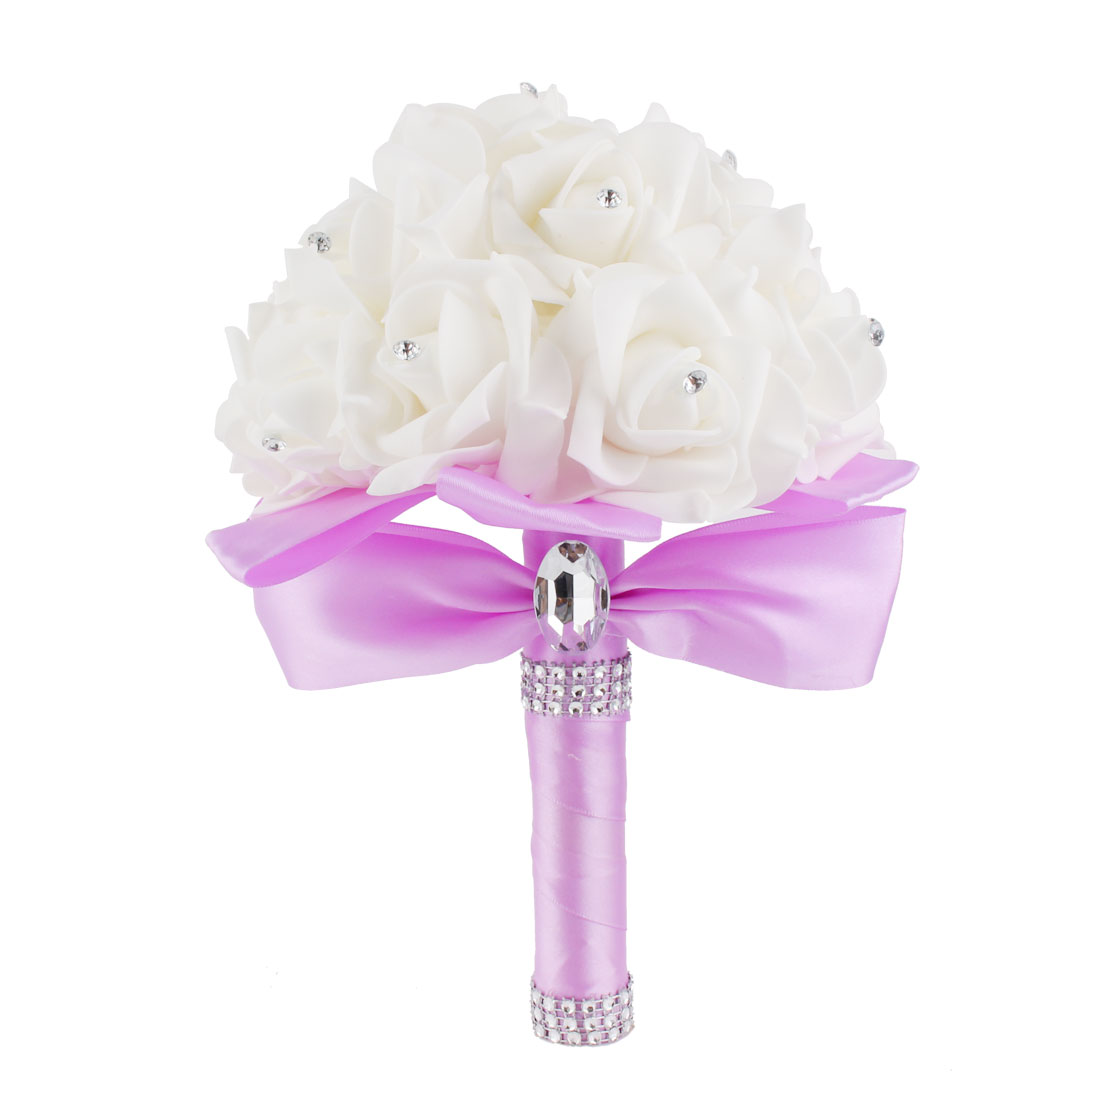 Bridal Wedding Bridesmaid Bouquet Decor Artificial Manmade Rose Flower Light Purple